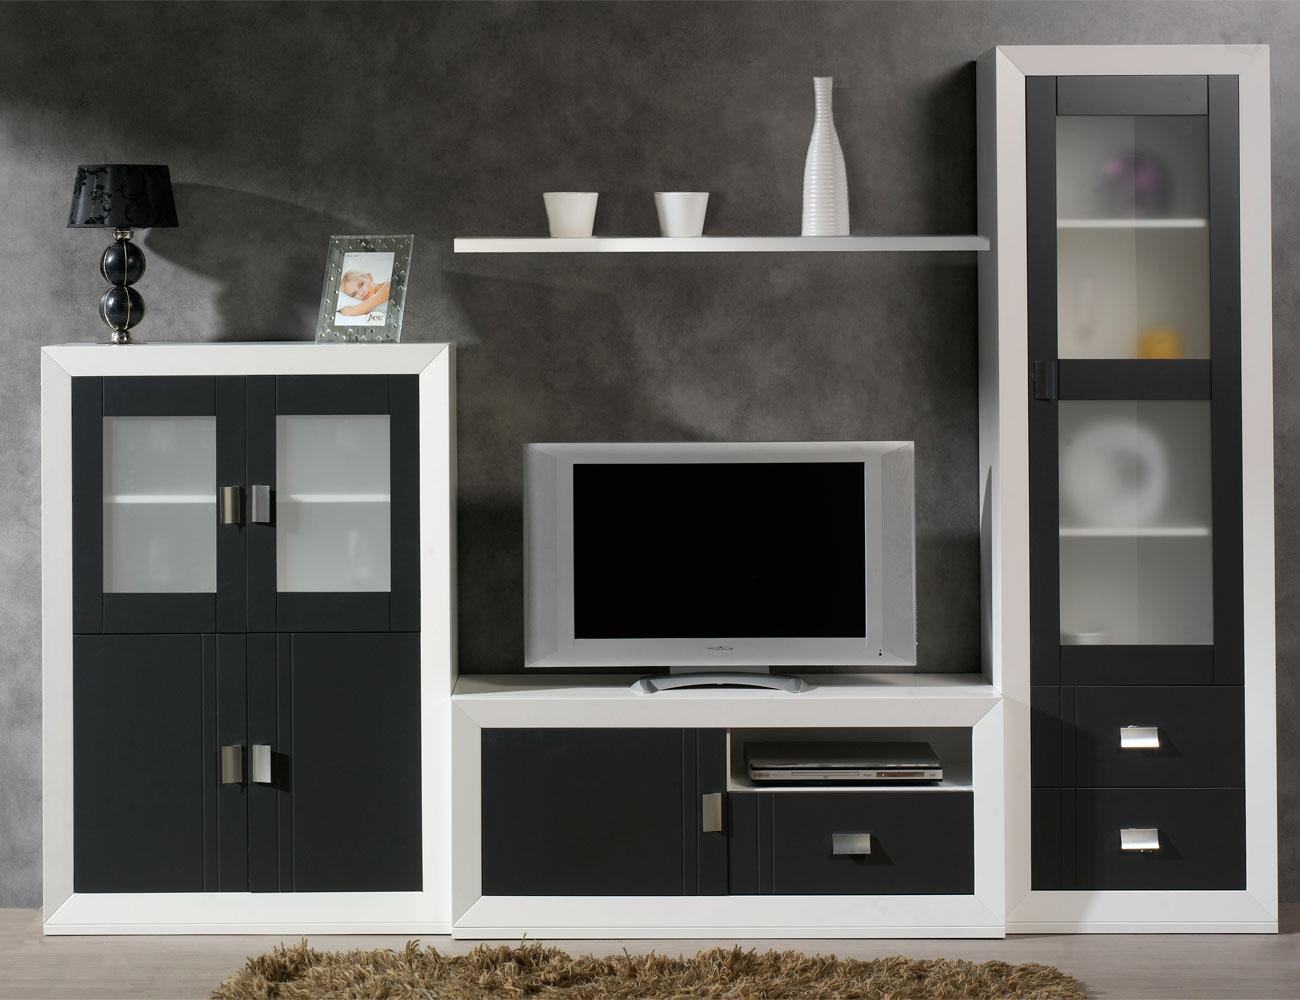 Muebles de sal n comedor color blanco con grafito 7117 for Mueble modular blanco